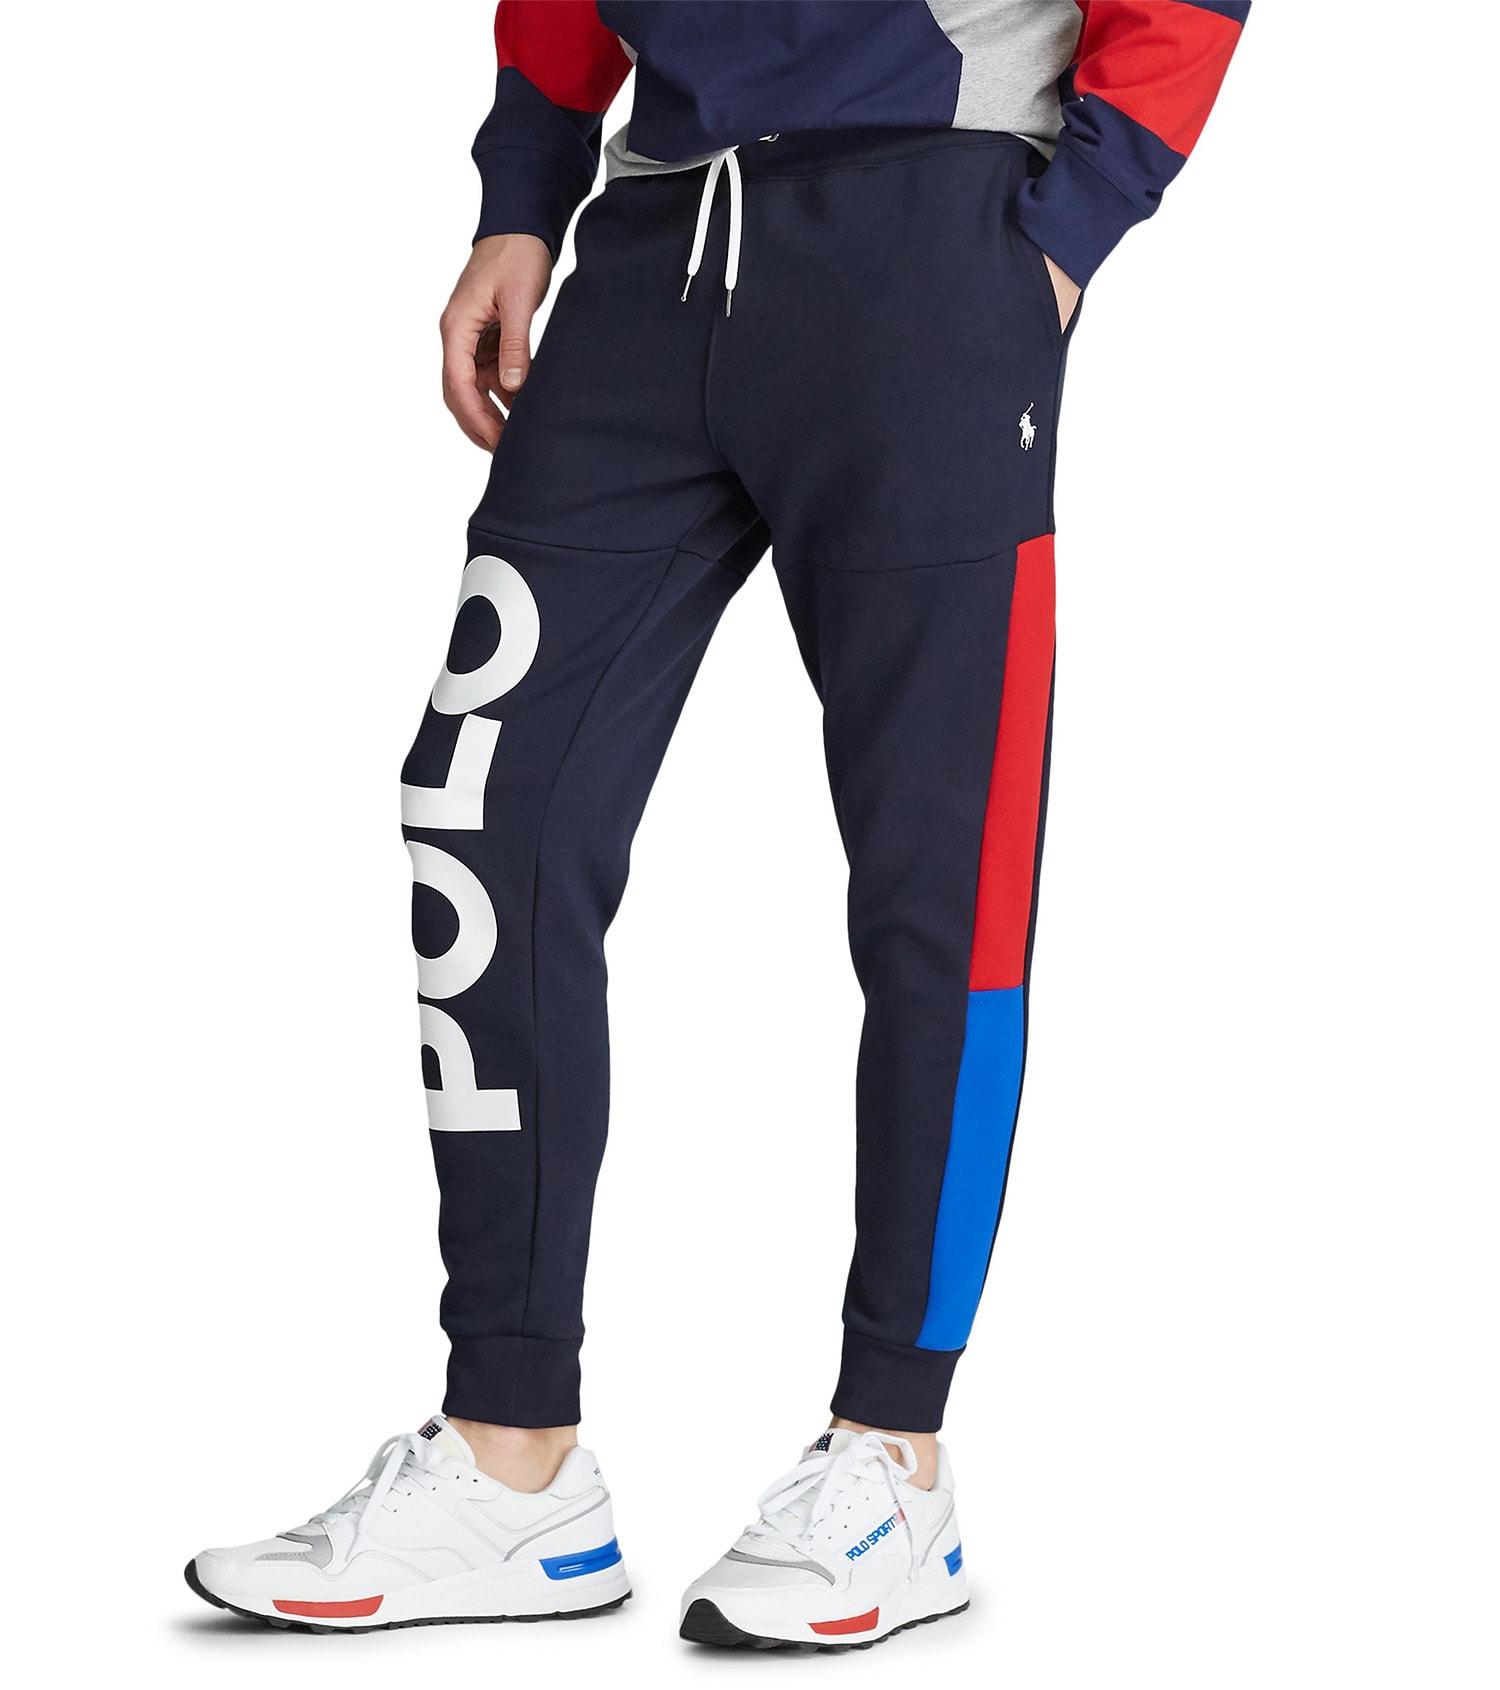 Polo Jogger Pant